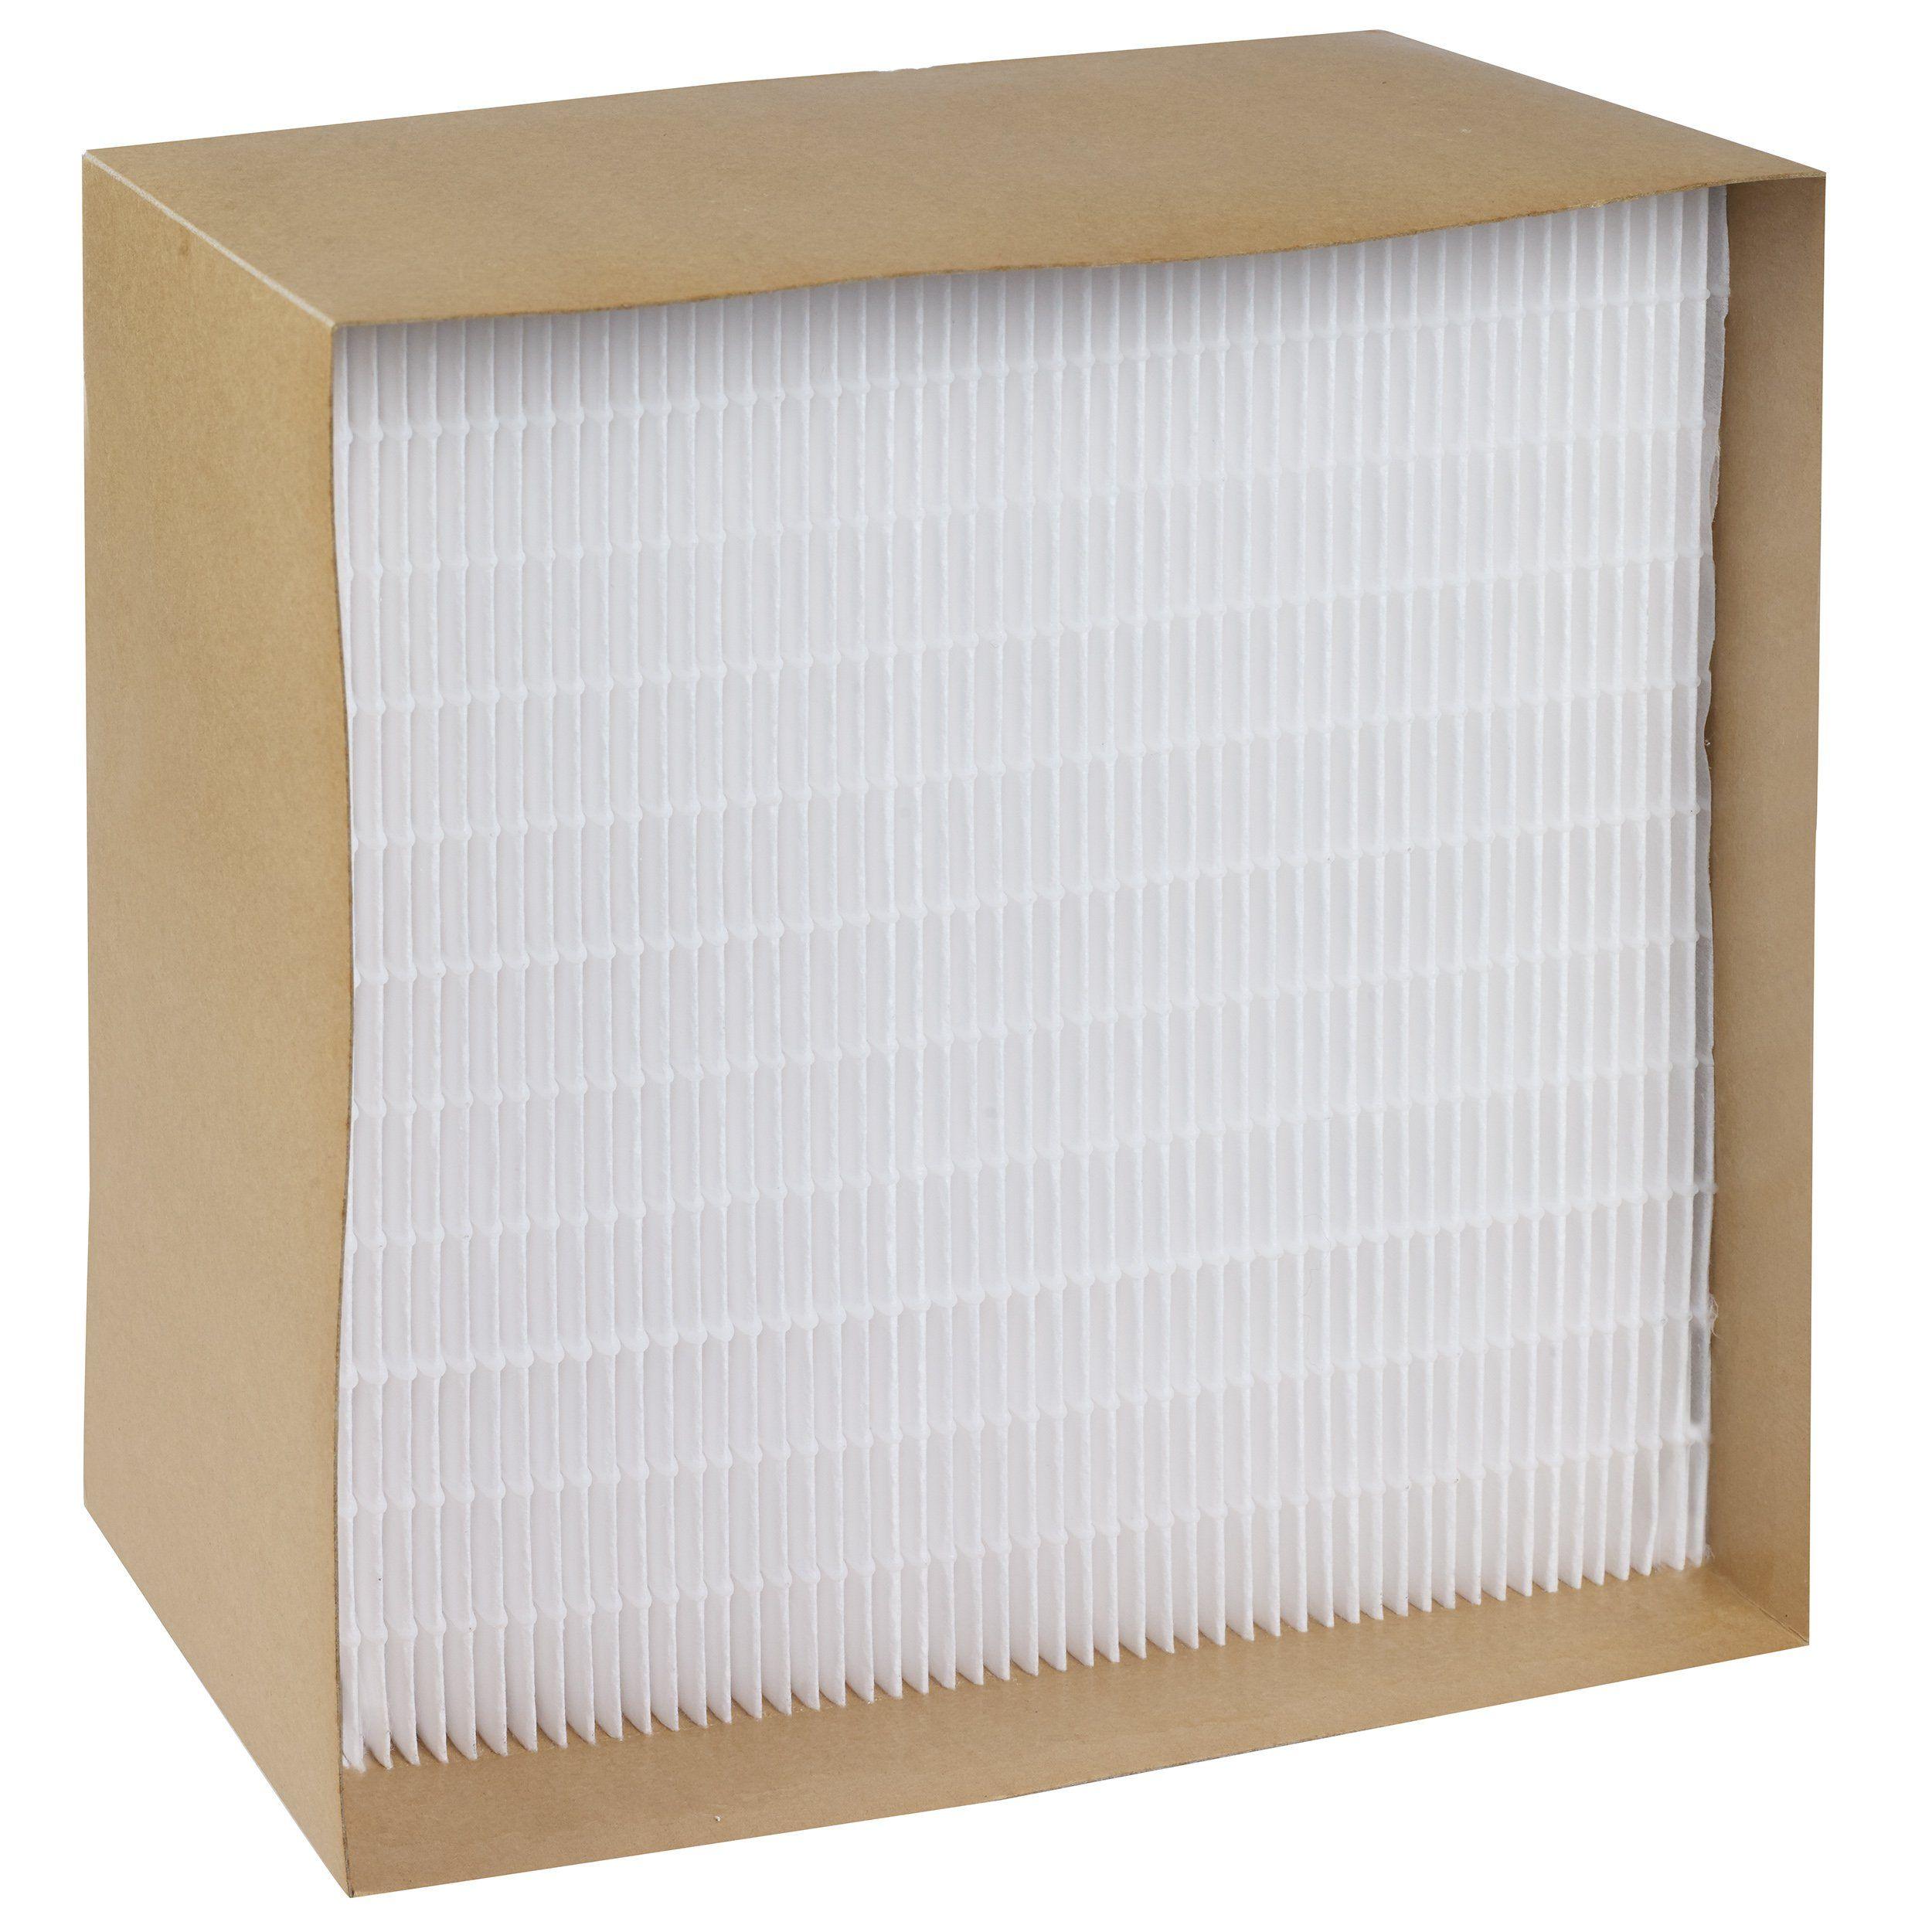 Affordable Smart Vent Compatible Filter Ventilation System Diy Air Conditioner Heat Pump